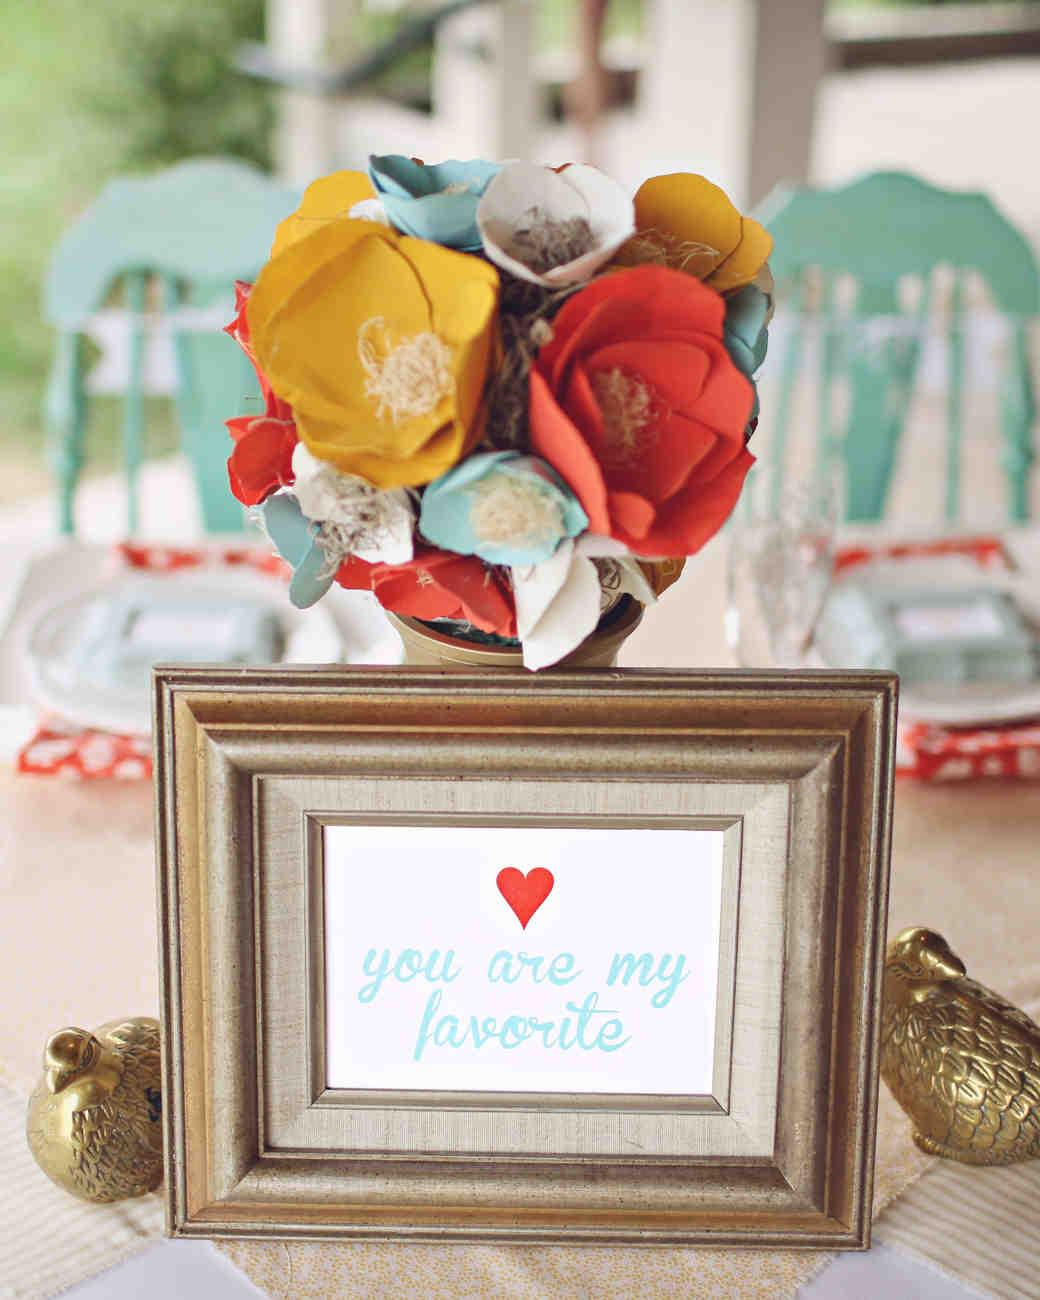 real-weddings-nichole-matthew-wd0413-173.jpg